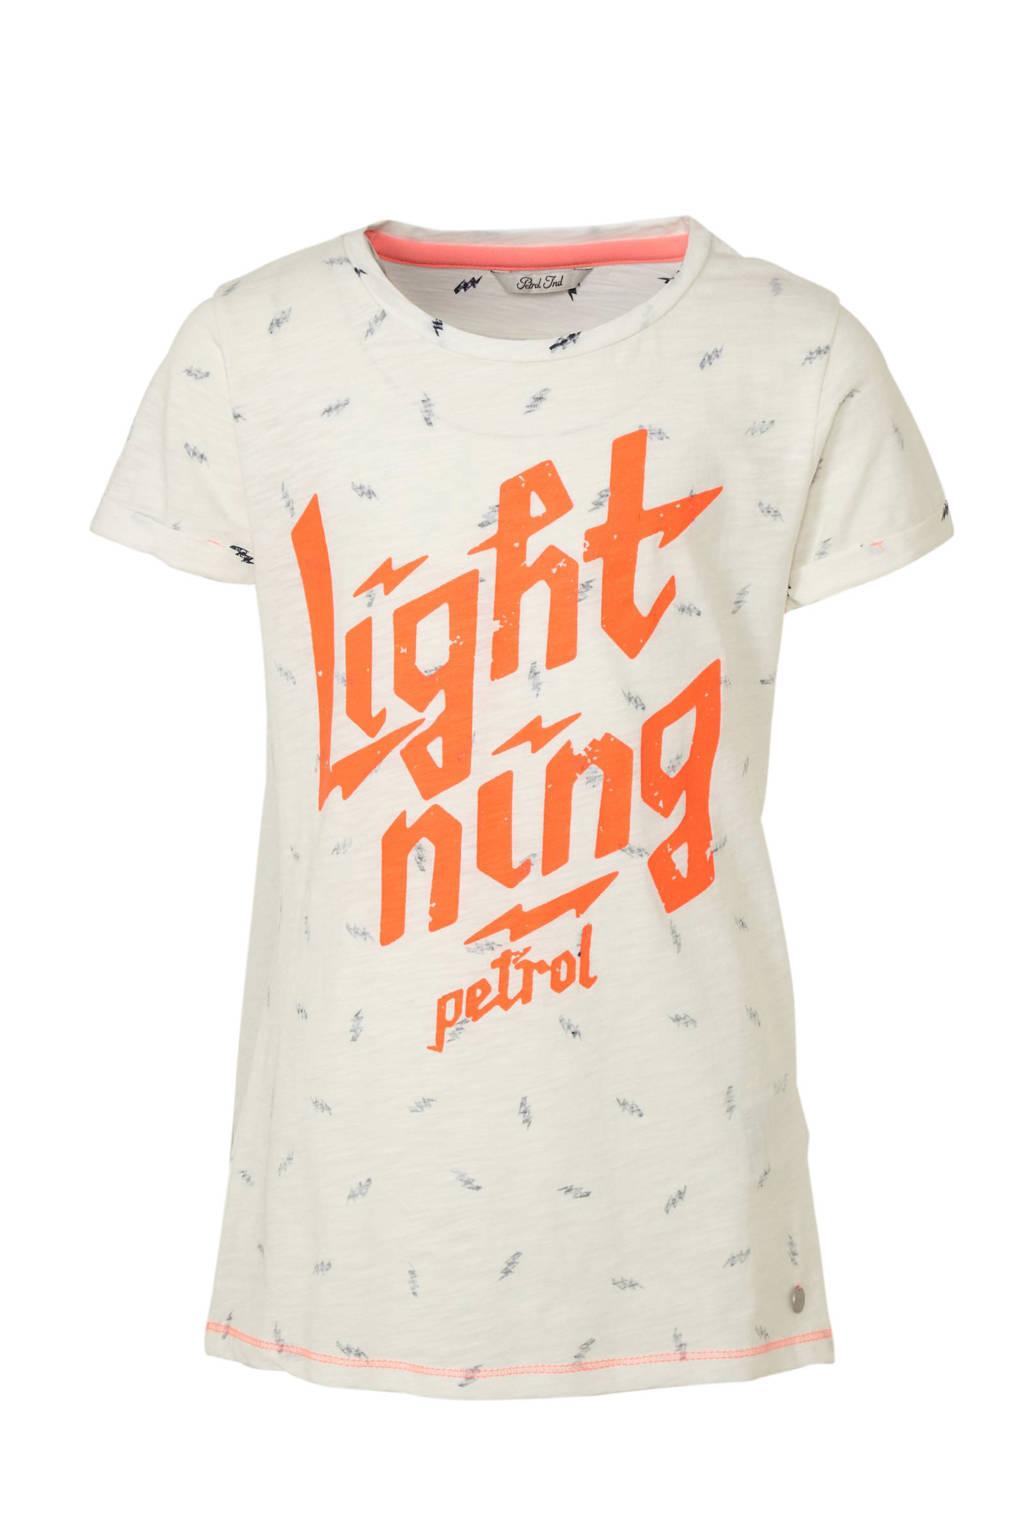 Petrol Industries T-shirt met printopdruk wit/oranje/grijs, Wit/oranje/grijs